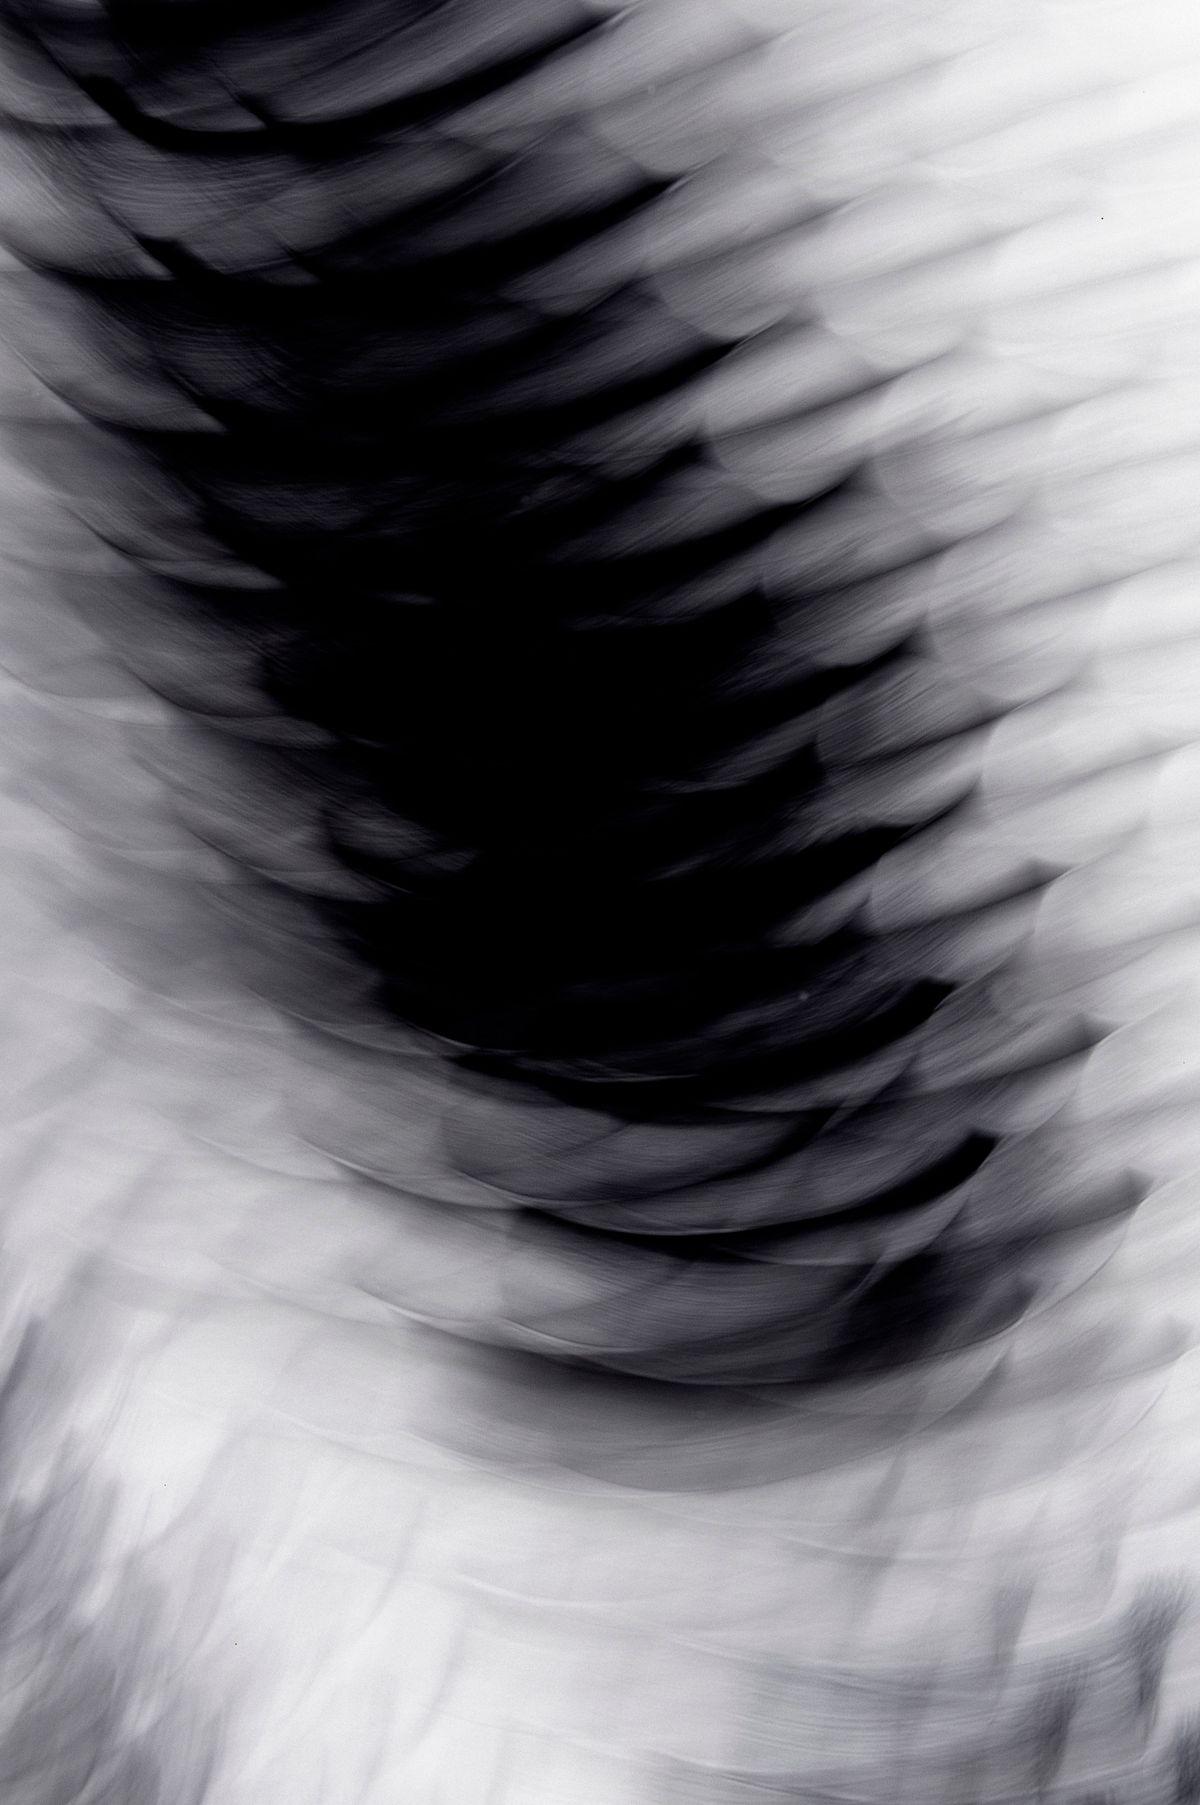 Fundidora, 2007, Black and White Abstract Photography, Shirine Gill